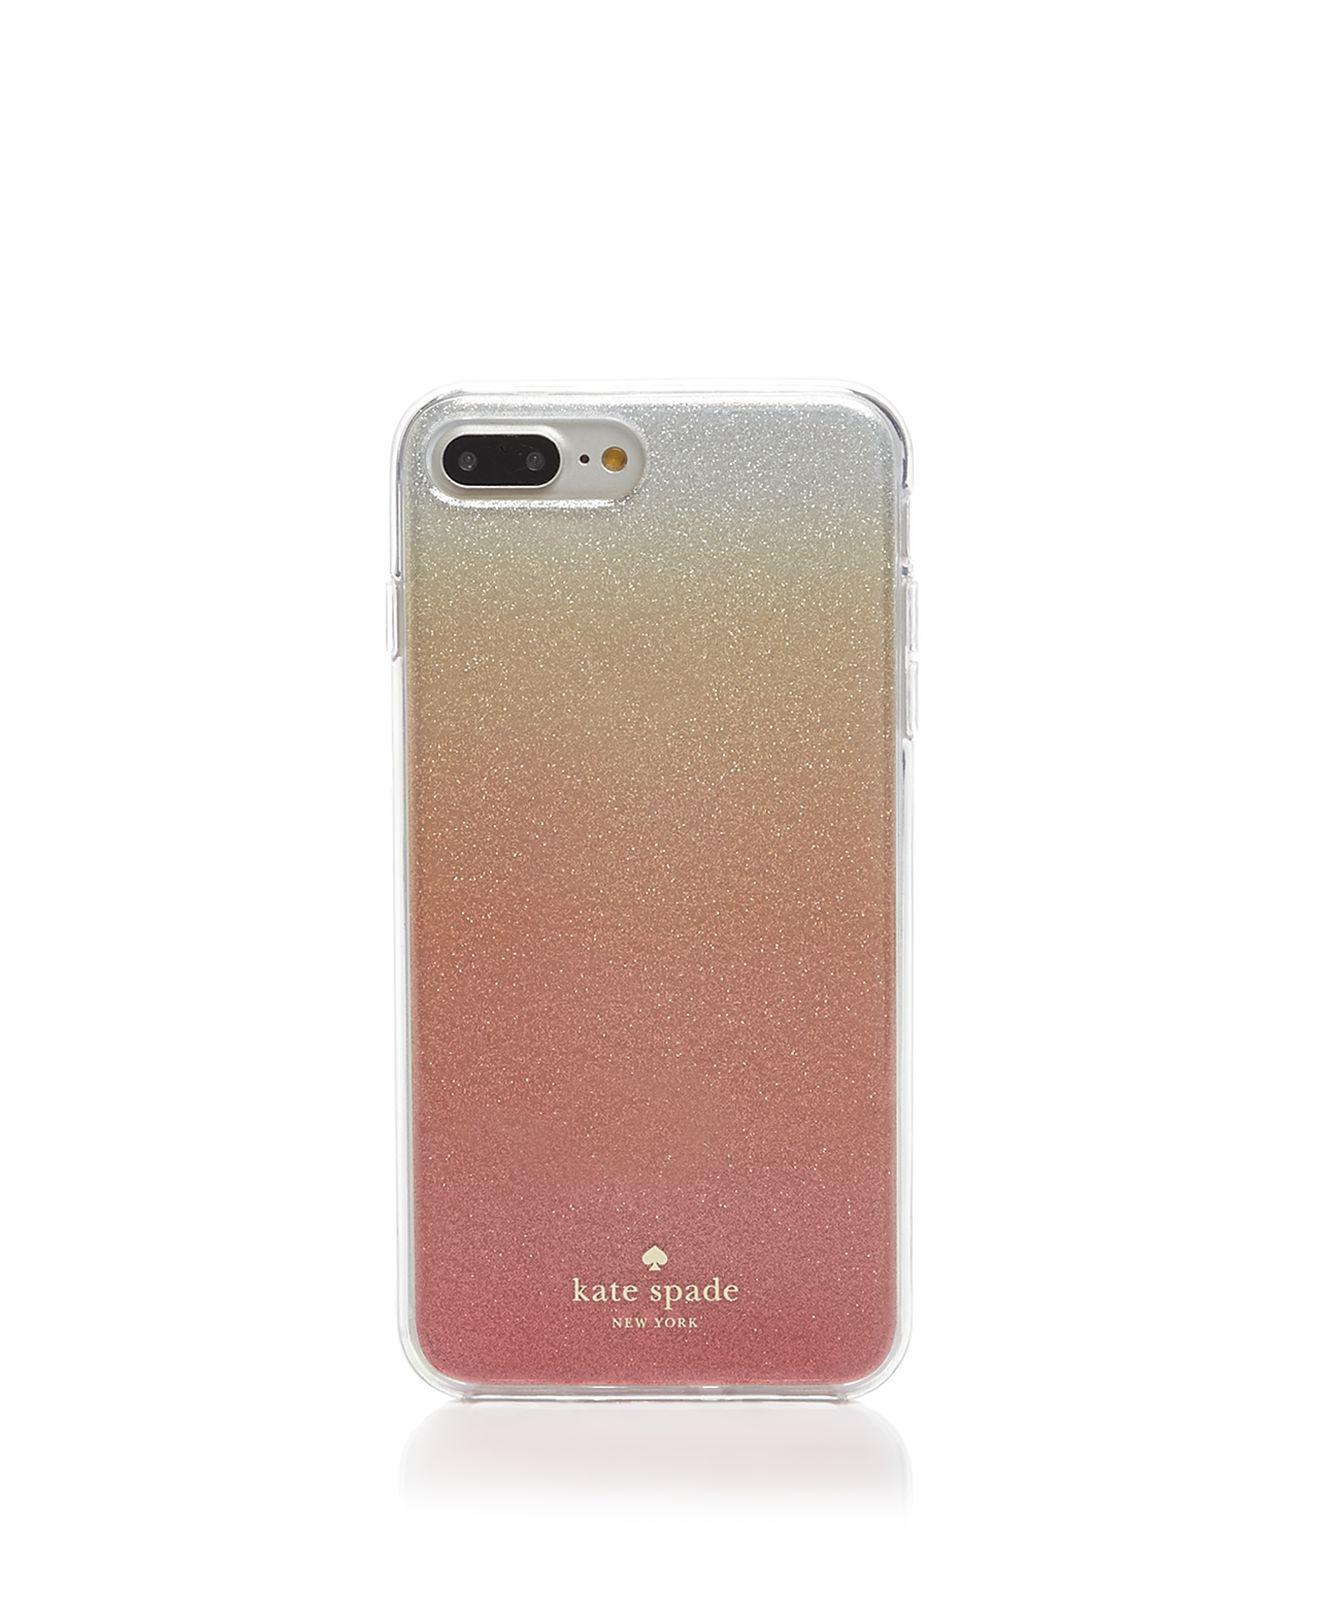 Kate Spade Iphone C Case